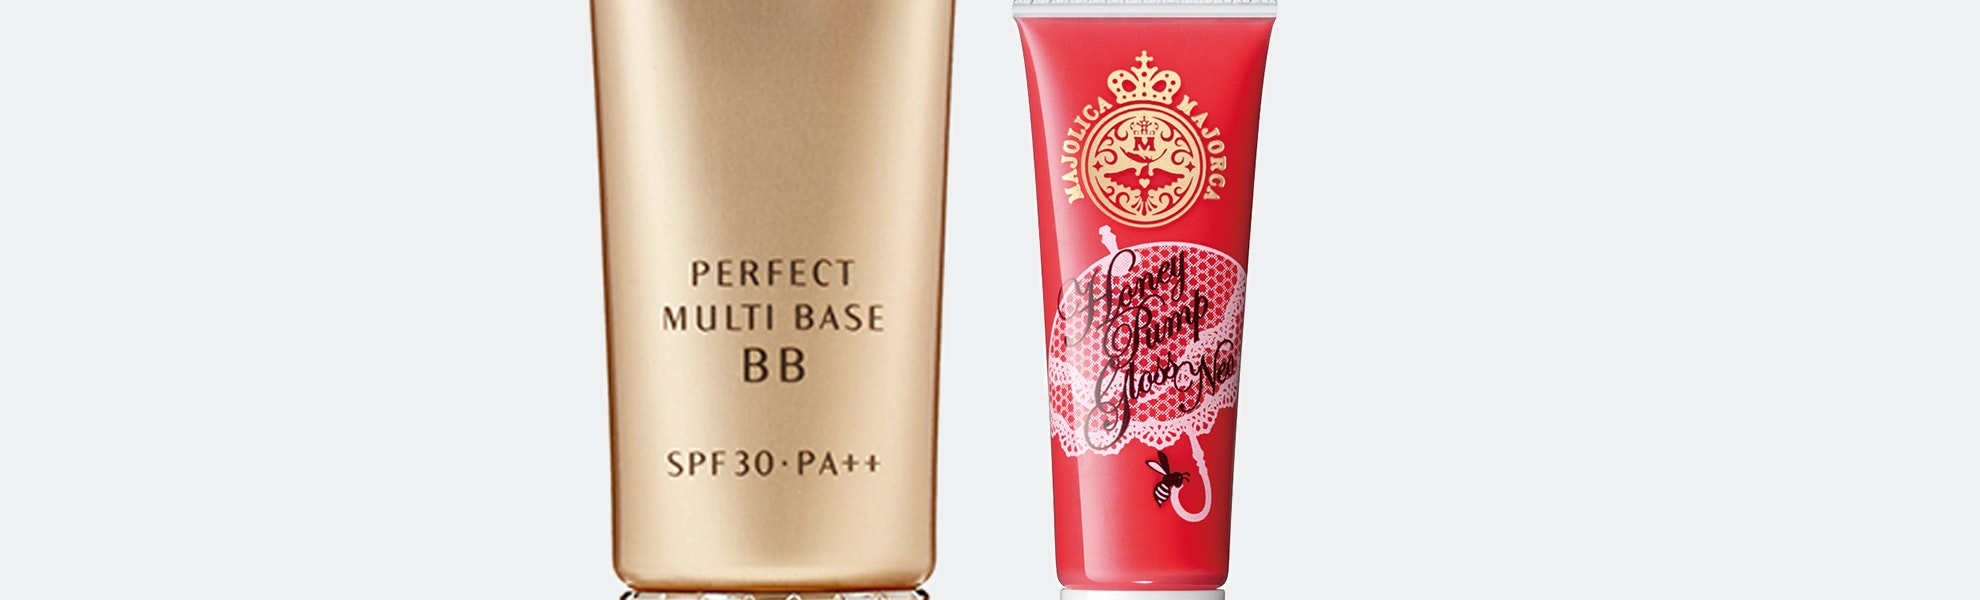 Shiseido Perfect Multi Base BB & Majolica Lip Gloss